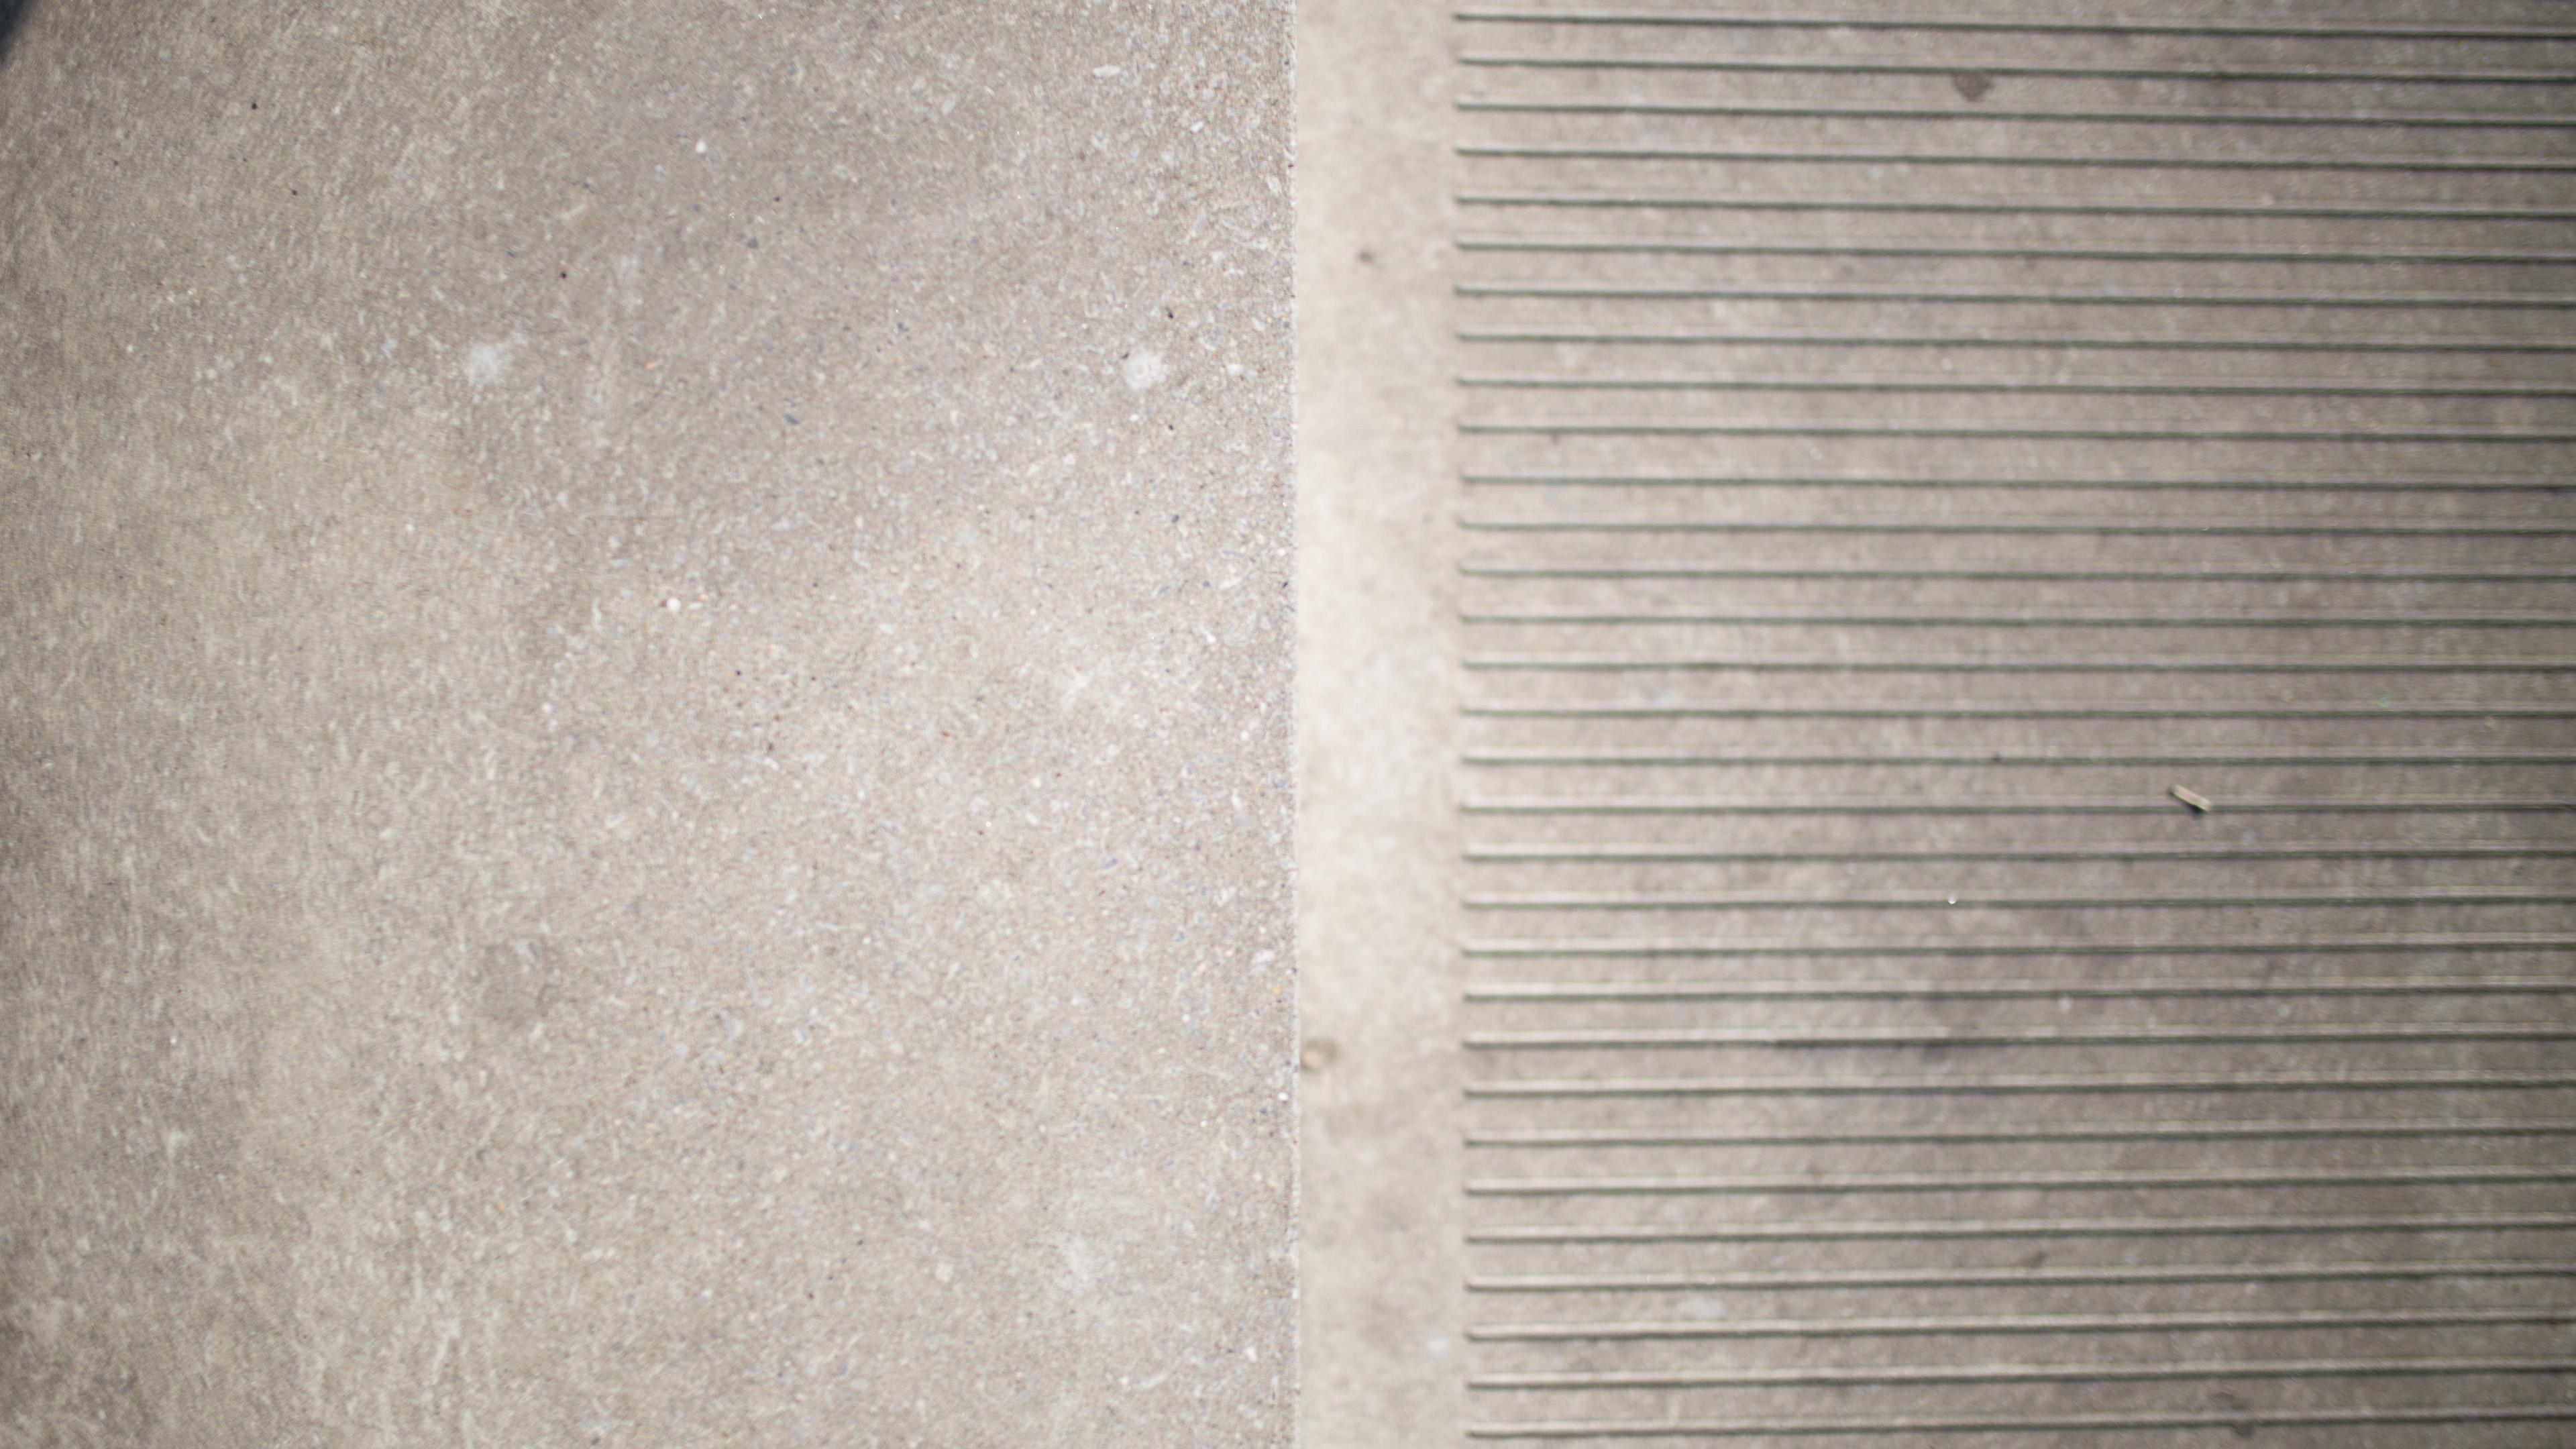 Street; Beton; Boden; Pattern; Struktur